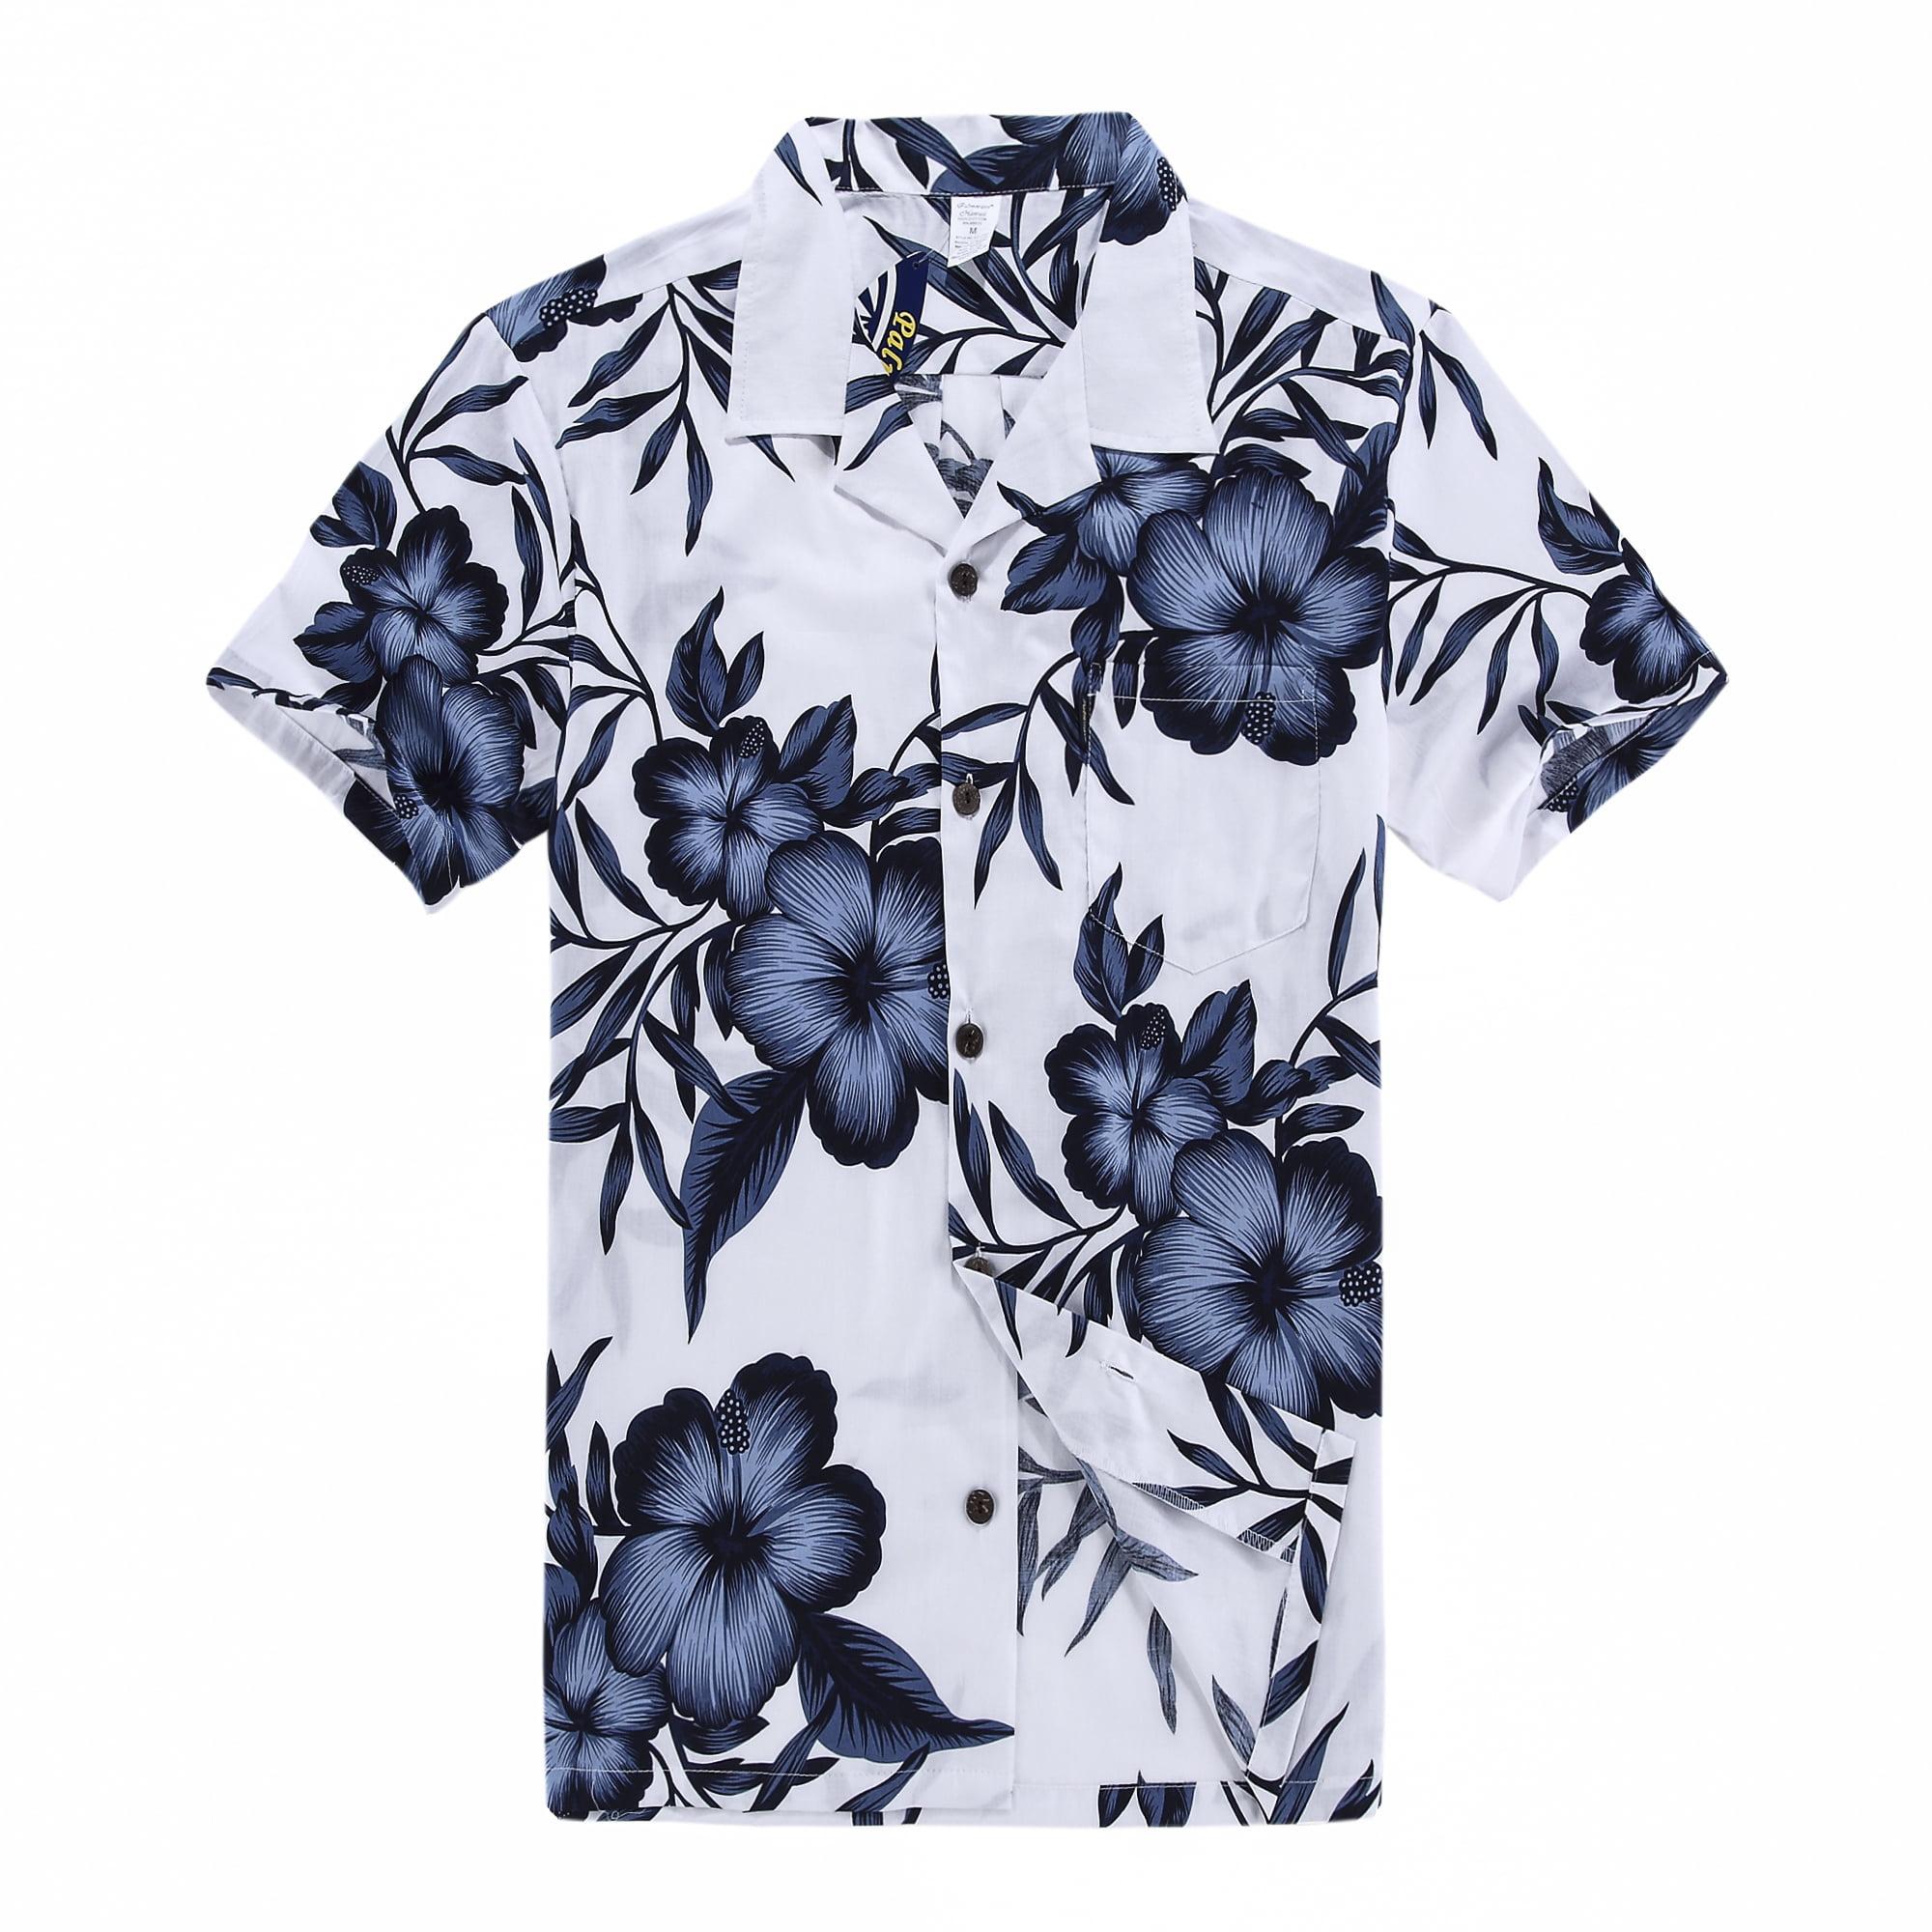 Hawaii Hangover - Hawaiian Shirt Aloha Shirt in White Floral - Walmart.com